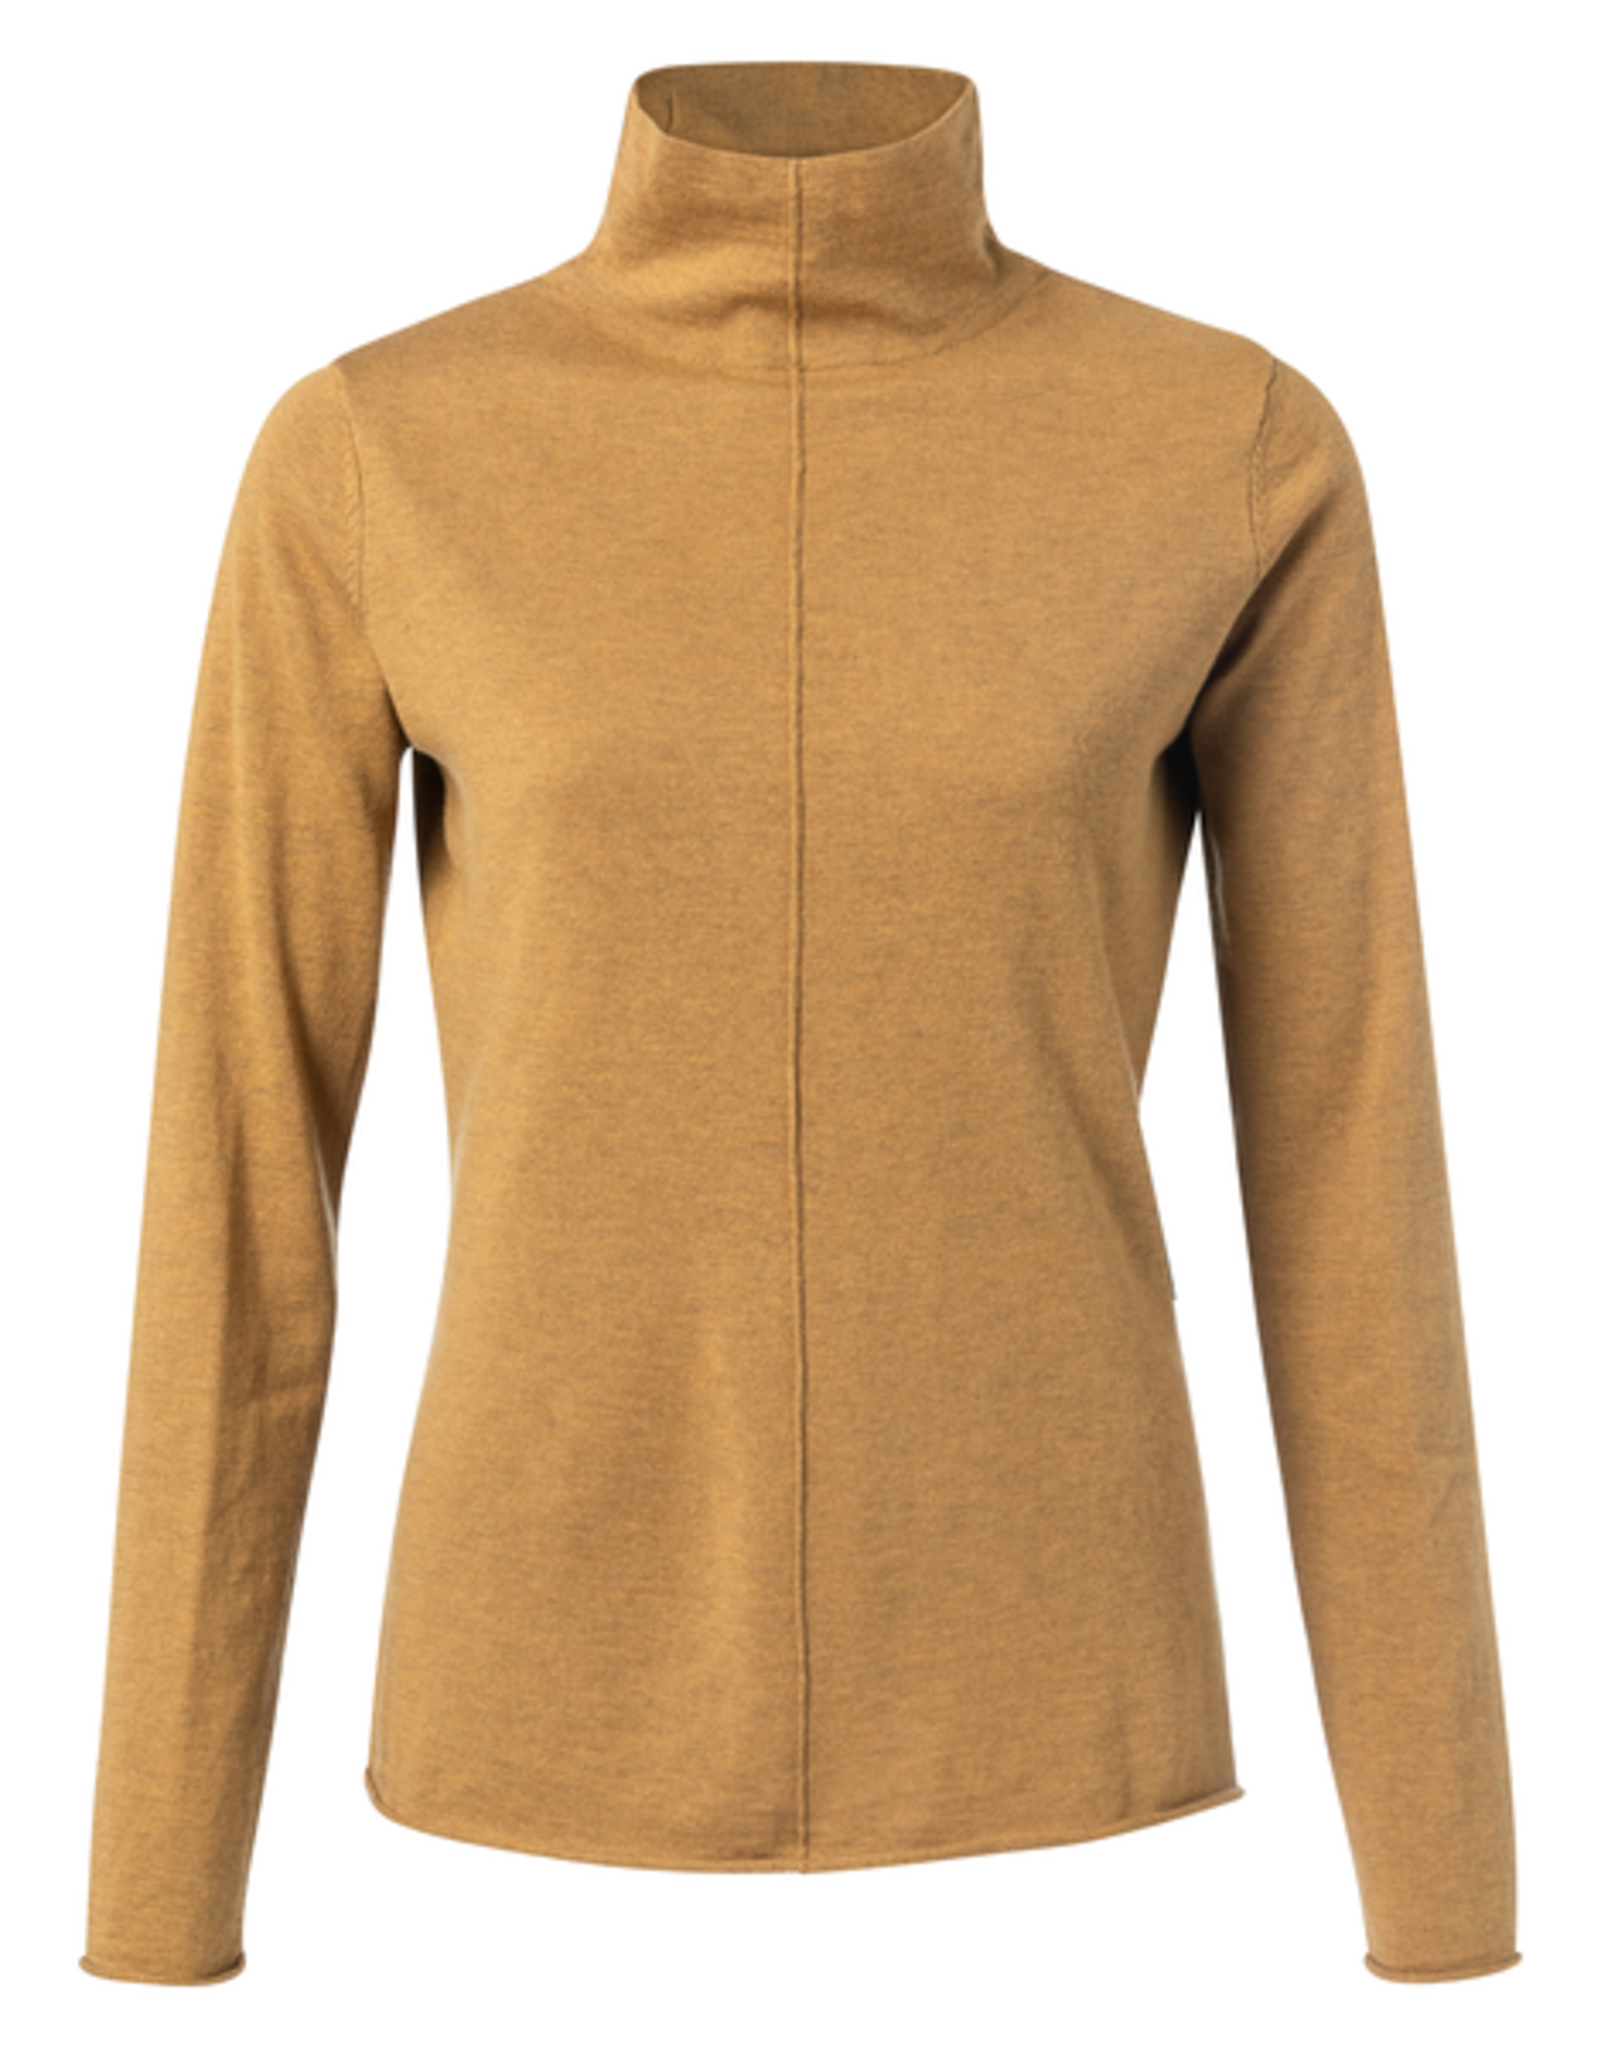 Yaya YAYA Cotton blend high neck sweater seam at front Mustard gold